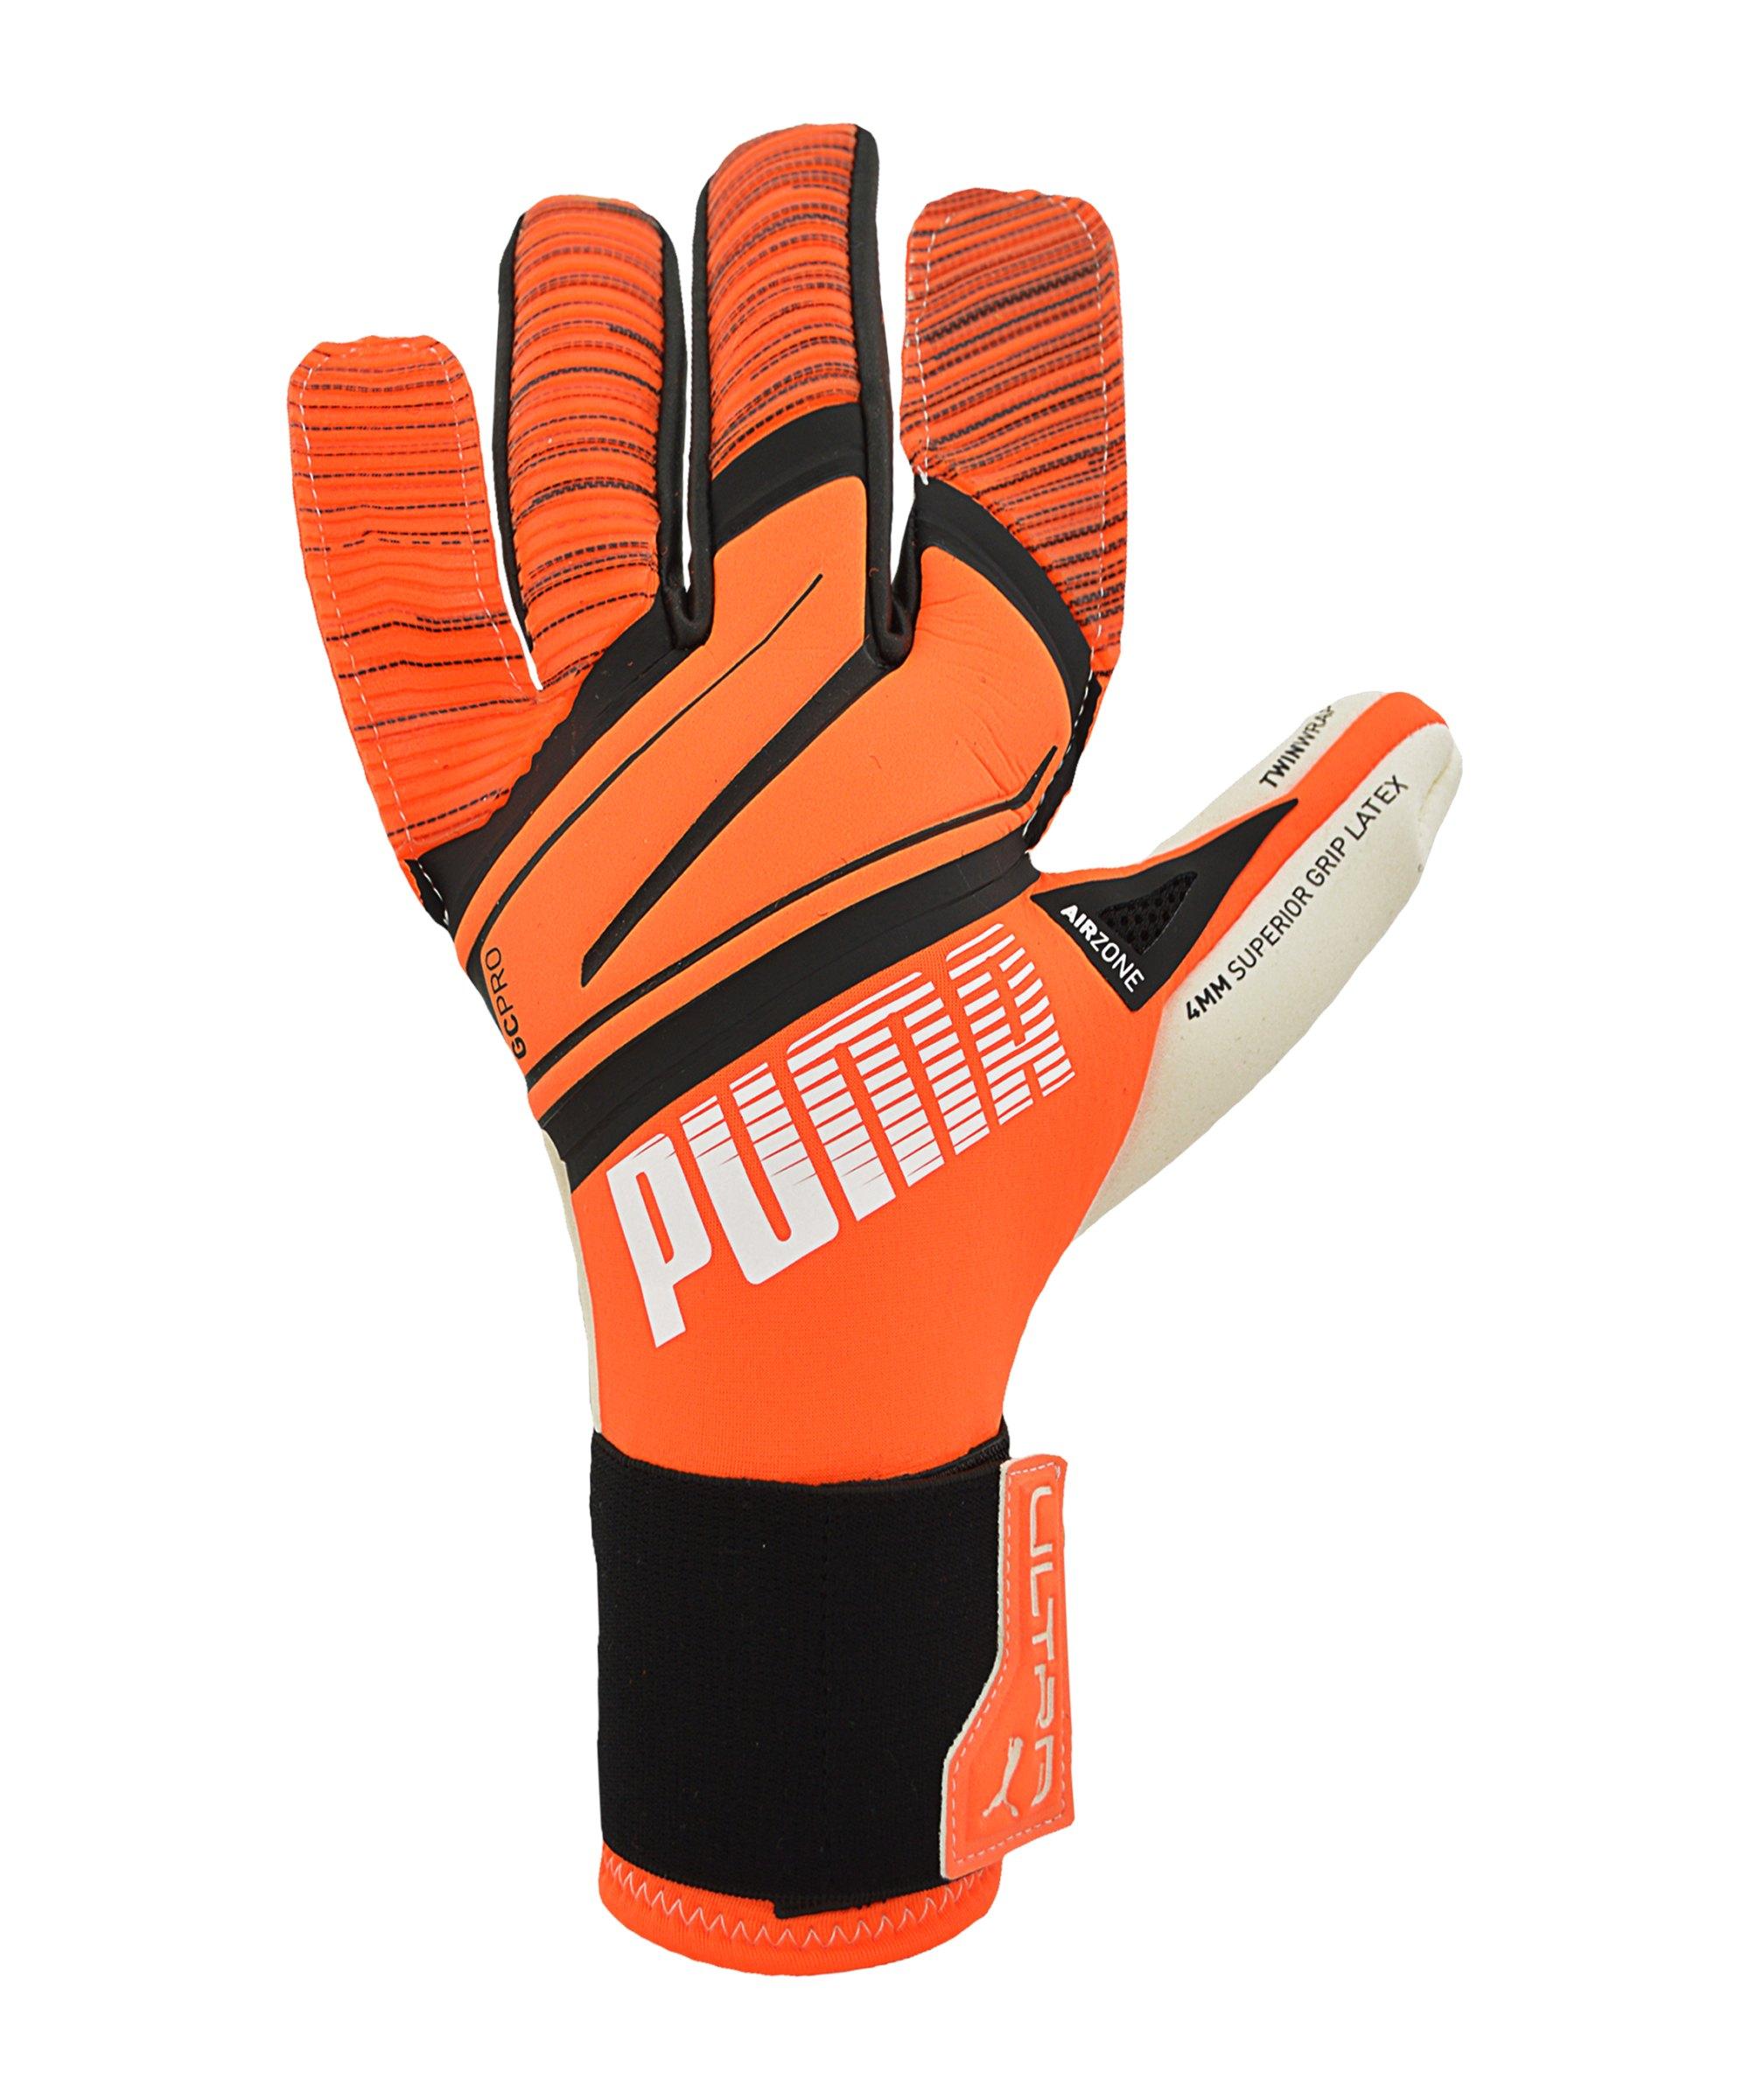 PUMA ULTRA Chasing Adrenalin Grip 1 Hybrid Pro Torwarthandschuh F01 - orange